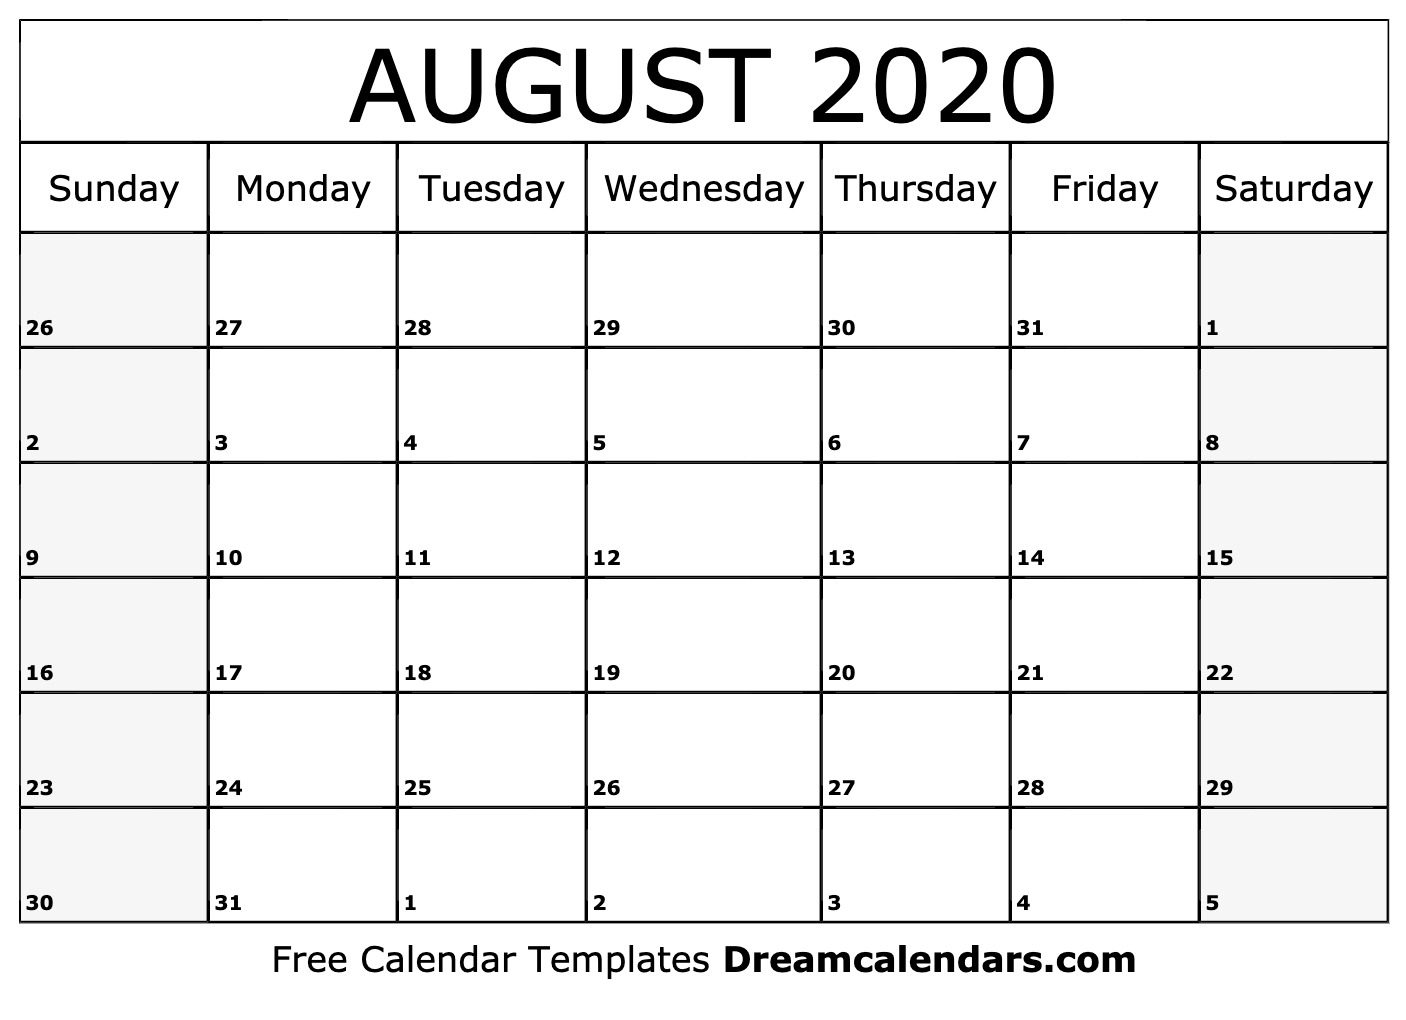 Printable Calendar Aug 2020 - Wpa.wpart.co